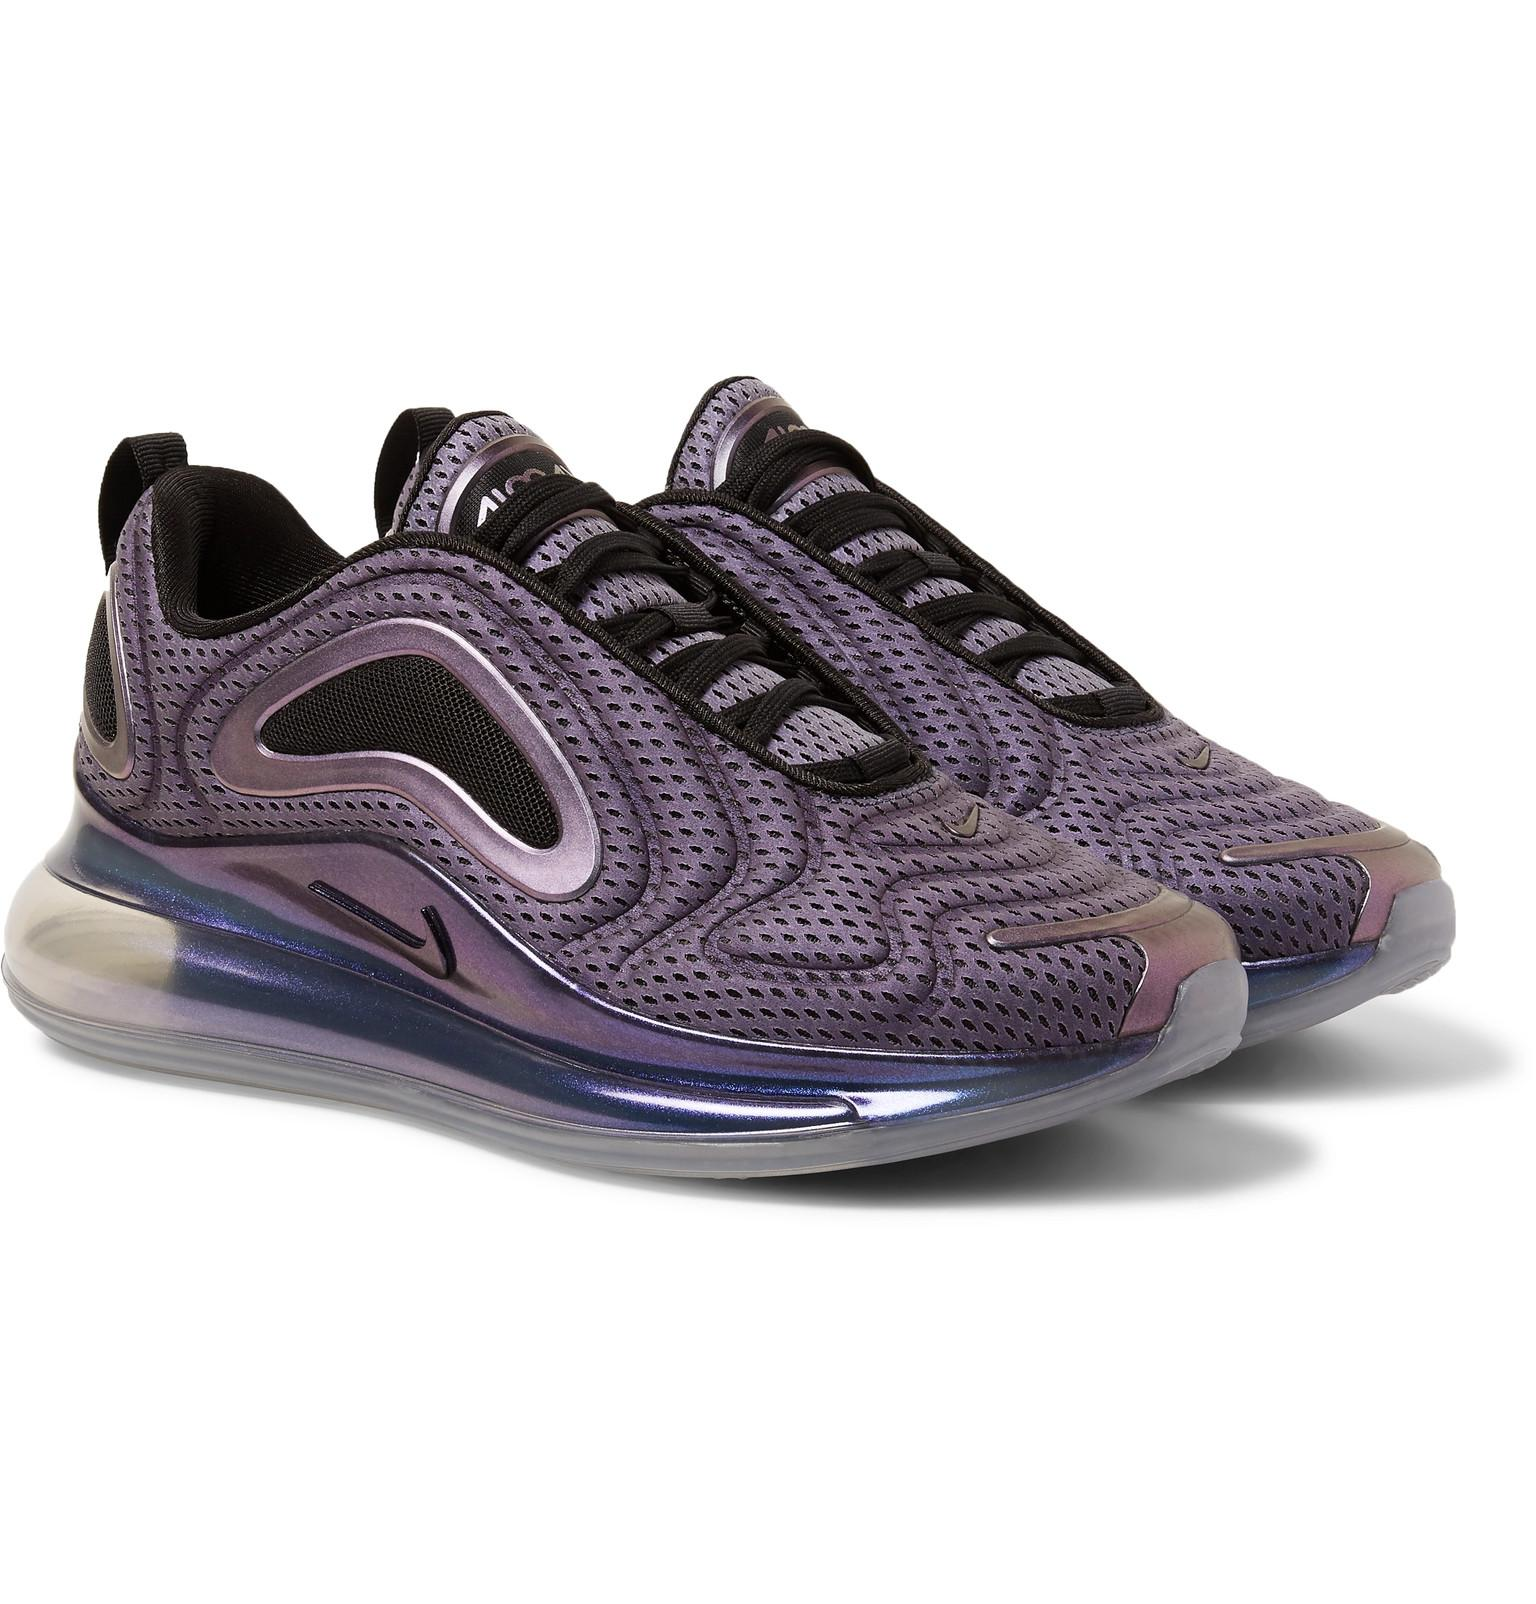 buy online 2f0ff e5a72 Nike Air Max 720 Aurora Borealis Mesh Sneakers in Purple for Men - Lyst